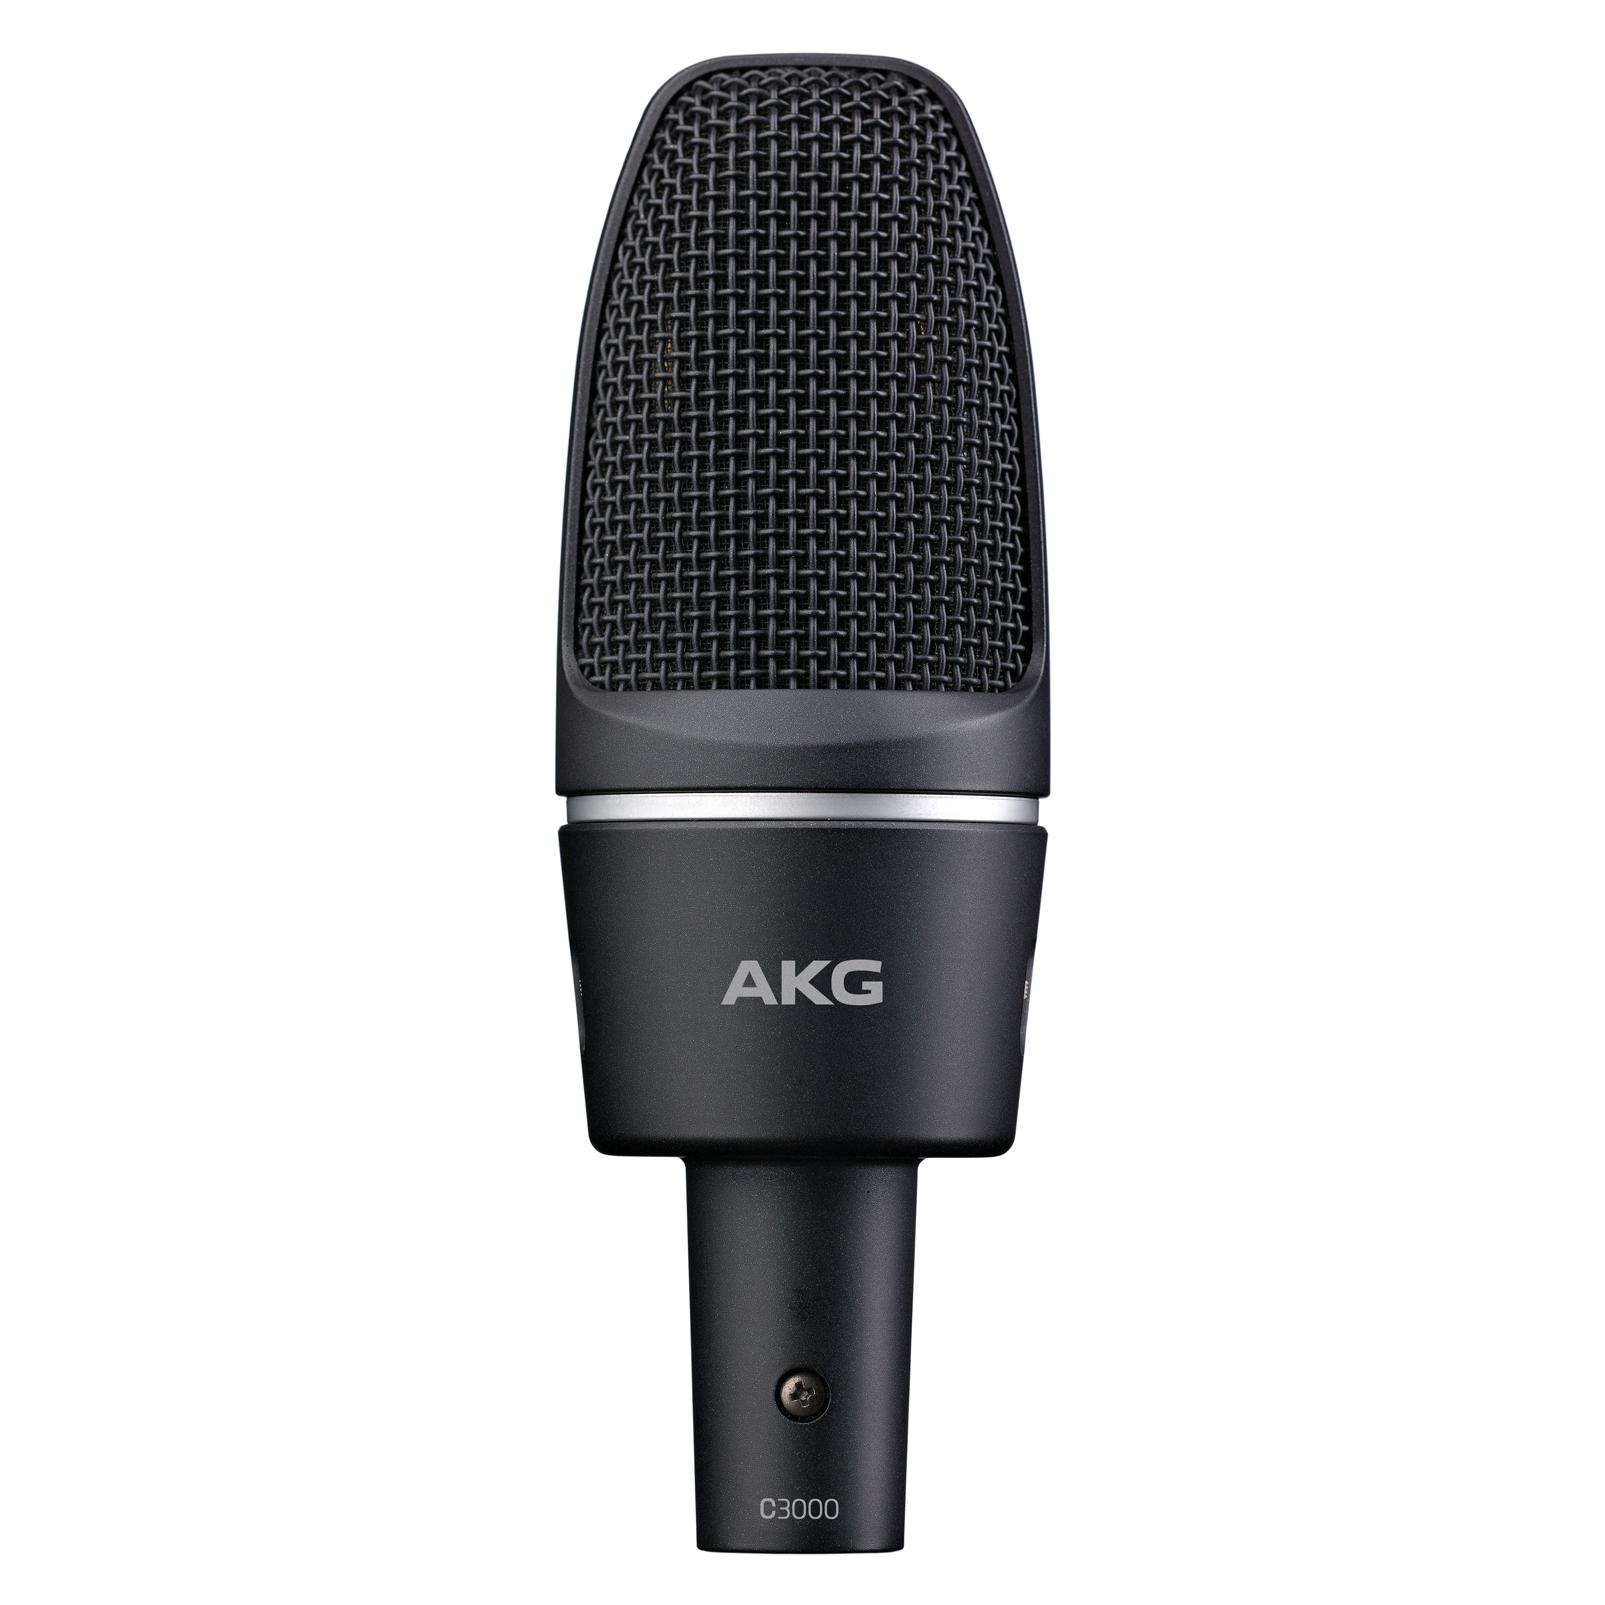 C3000 - Black - High-performance large-diaphragm condenser microphone - Hero